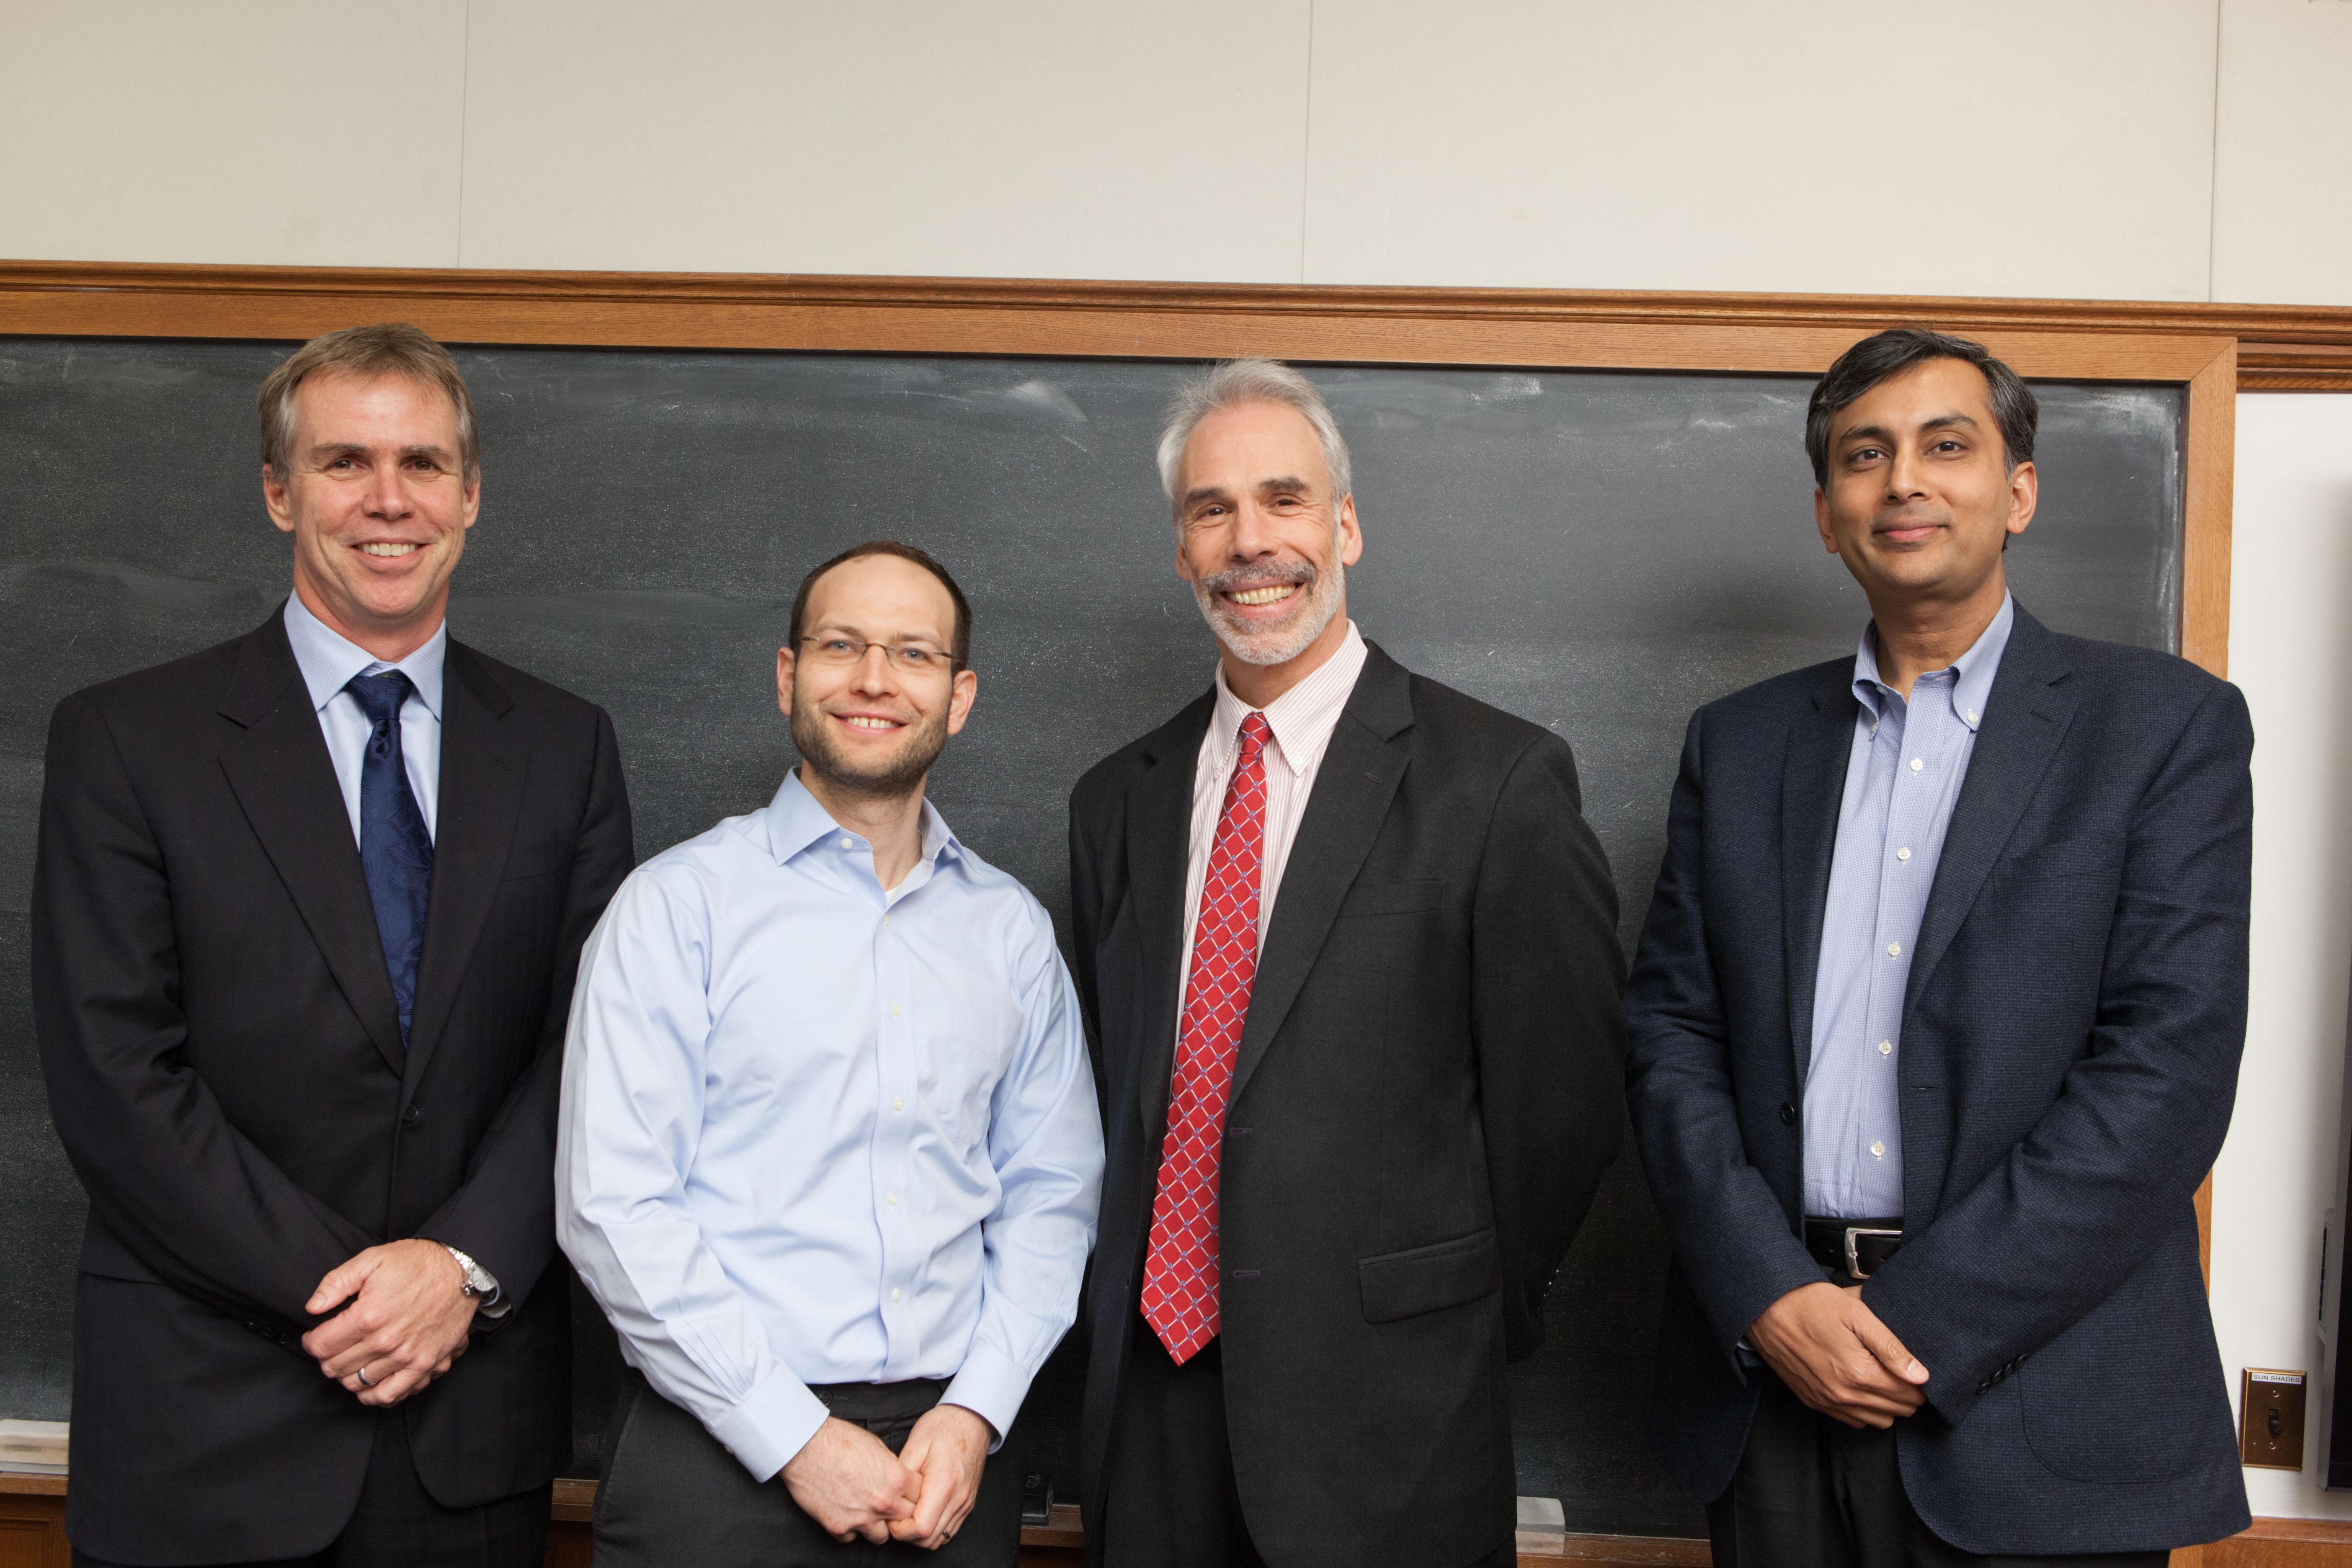 Berkeley Law Prof. Eric Talley, YLS Prof. Yair Listokin '06, Penn. Law Prof. Edward Rock, and Harvard Business Prof. Mihir Desai